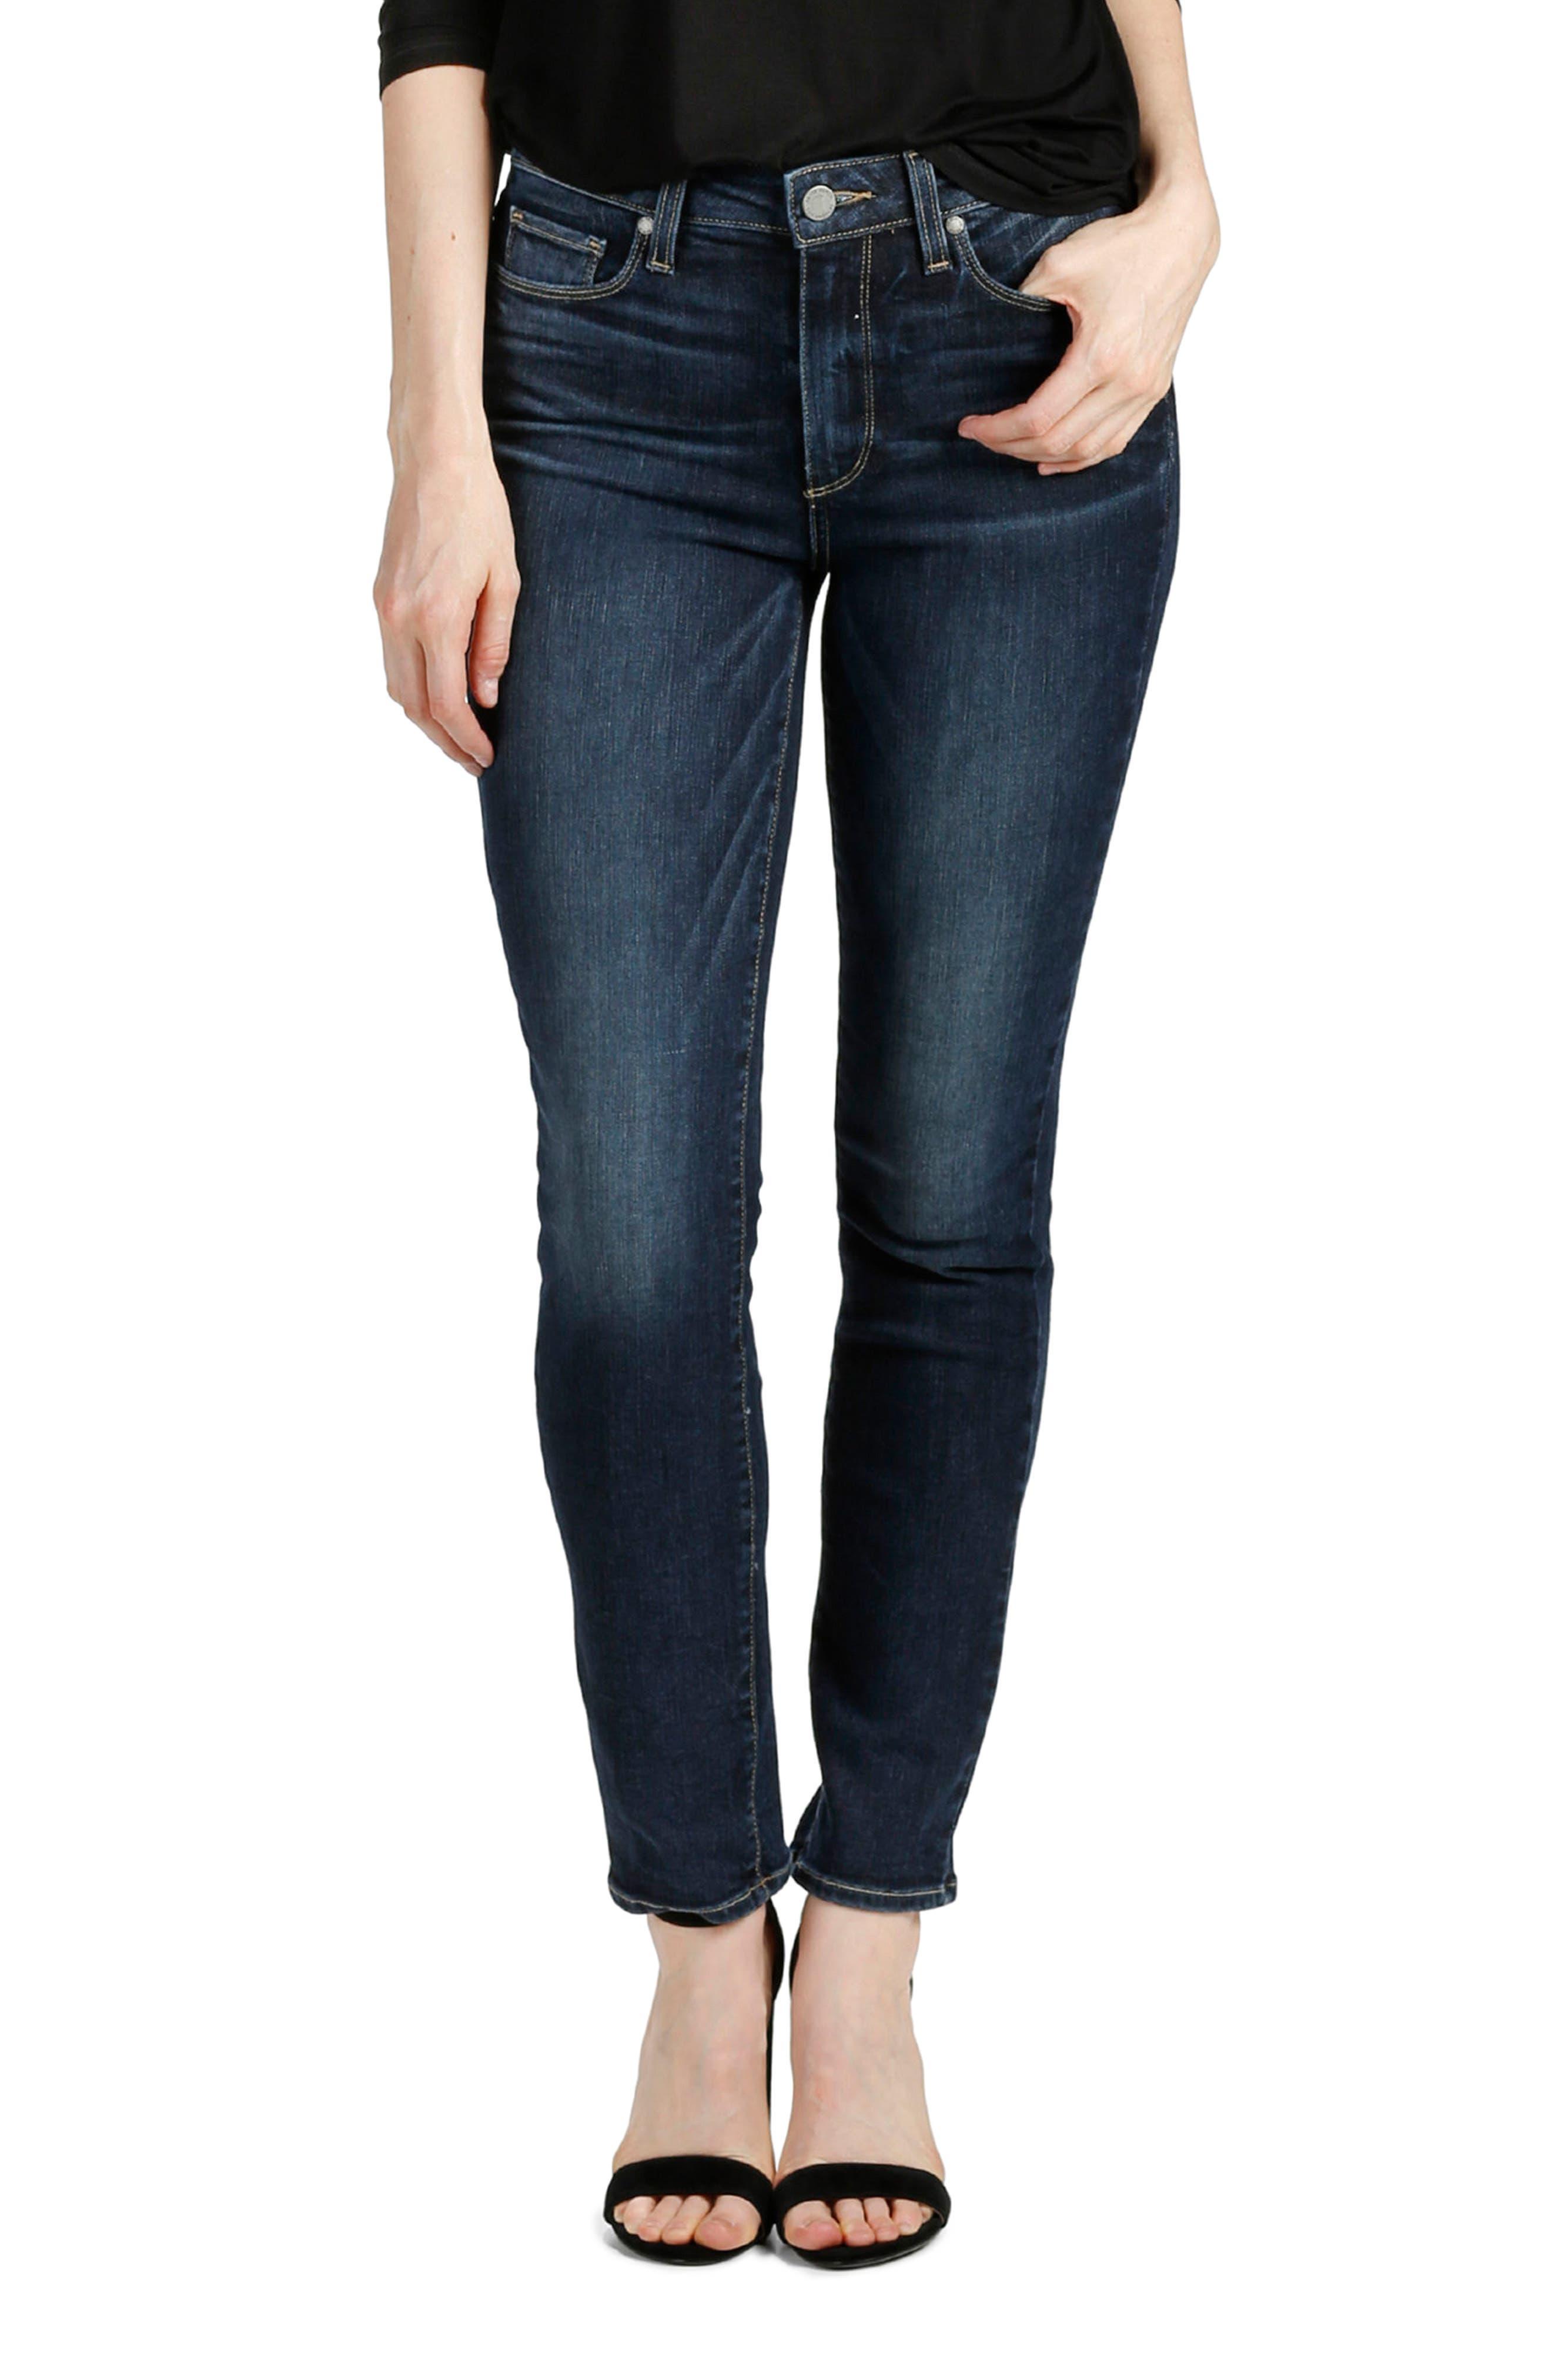 Transcend Vintage - Hoxton Ankle Peg Skinny Jeans,                             Main thumbnail 1, color,                             Jerry Girl